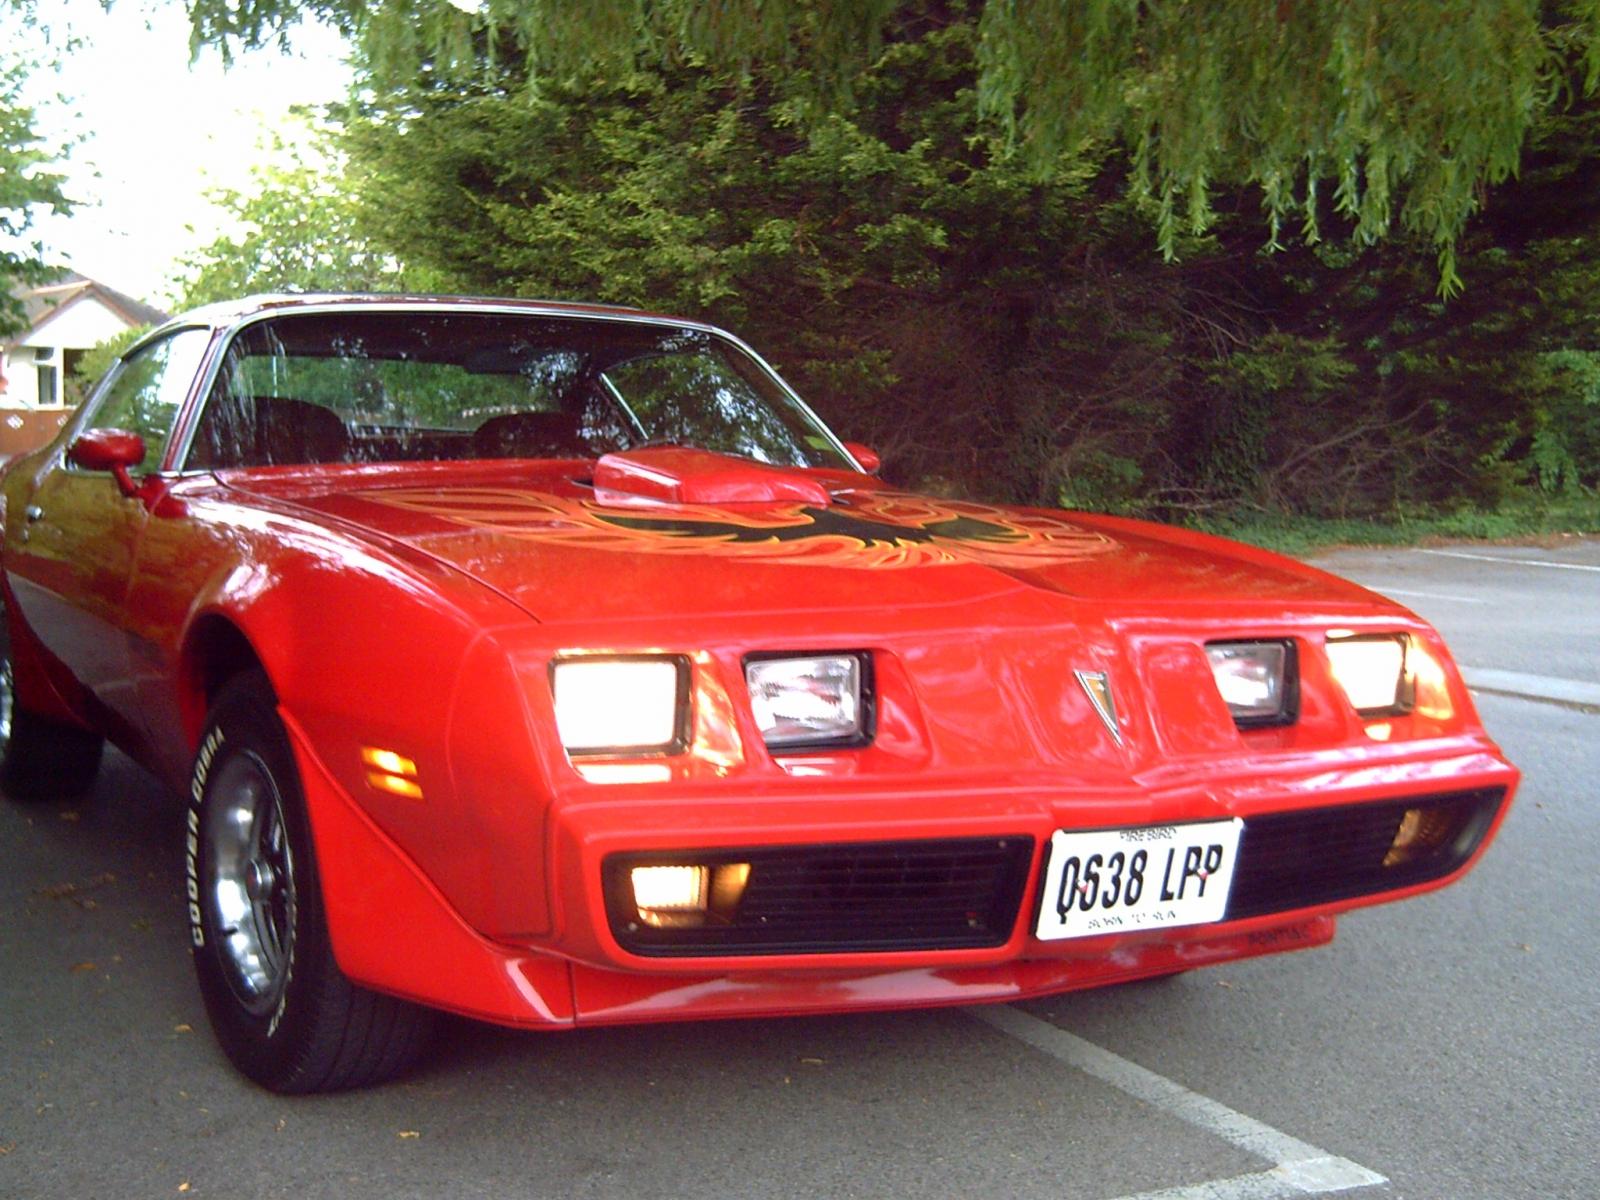 1979 Pontiac Trans Am Red Rocket | 1979 pontiac trans am, Pontiac, Trans am | 1979 Trans Am Fuse Box |  | Pinterest